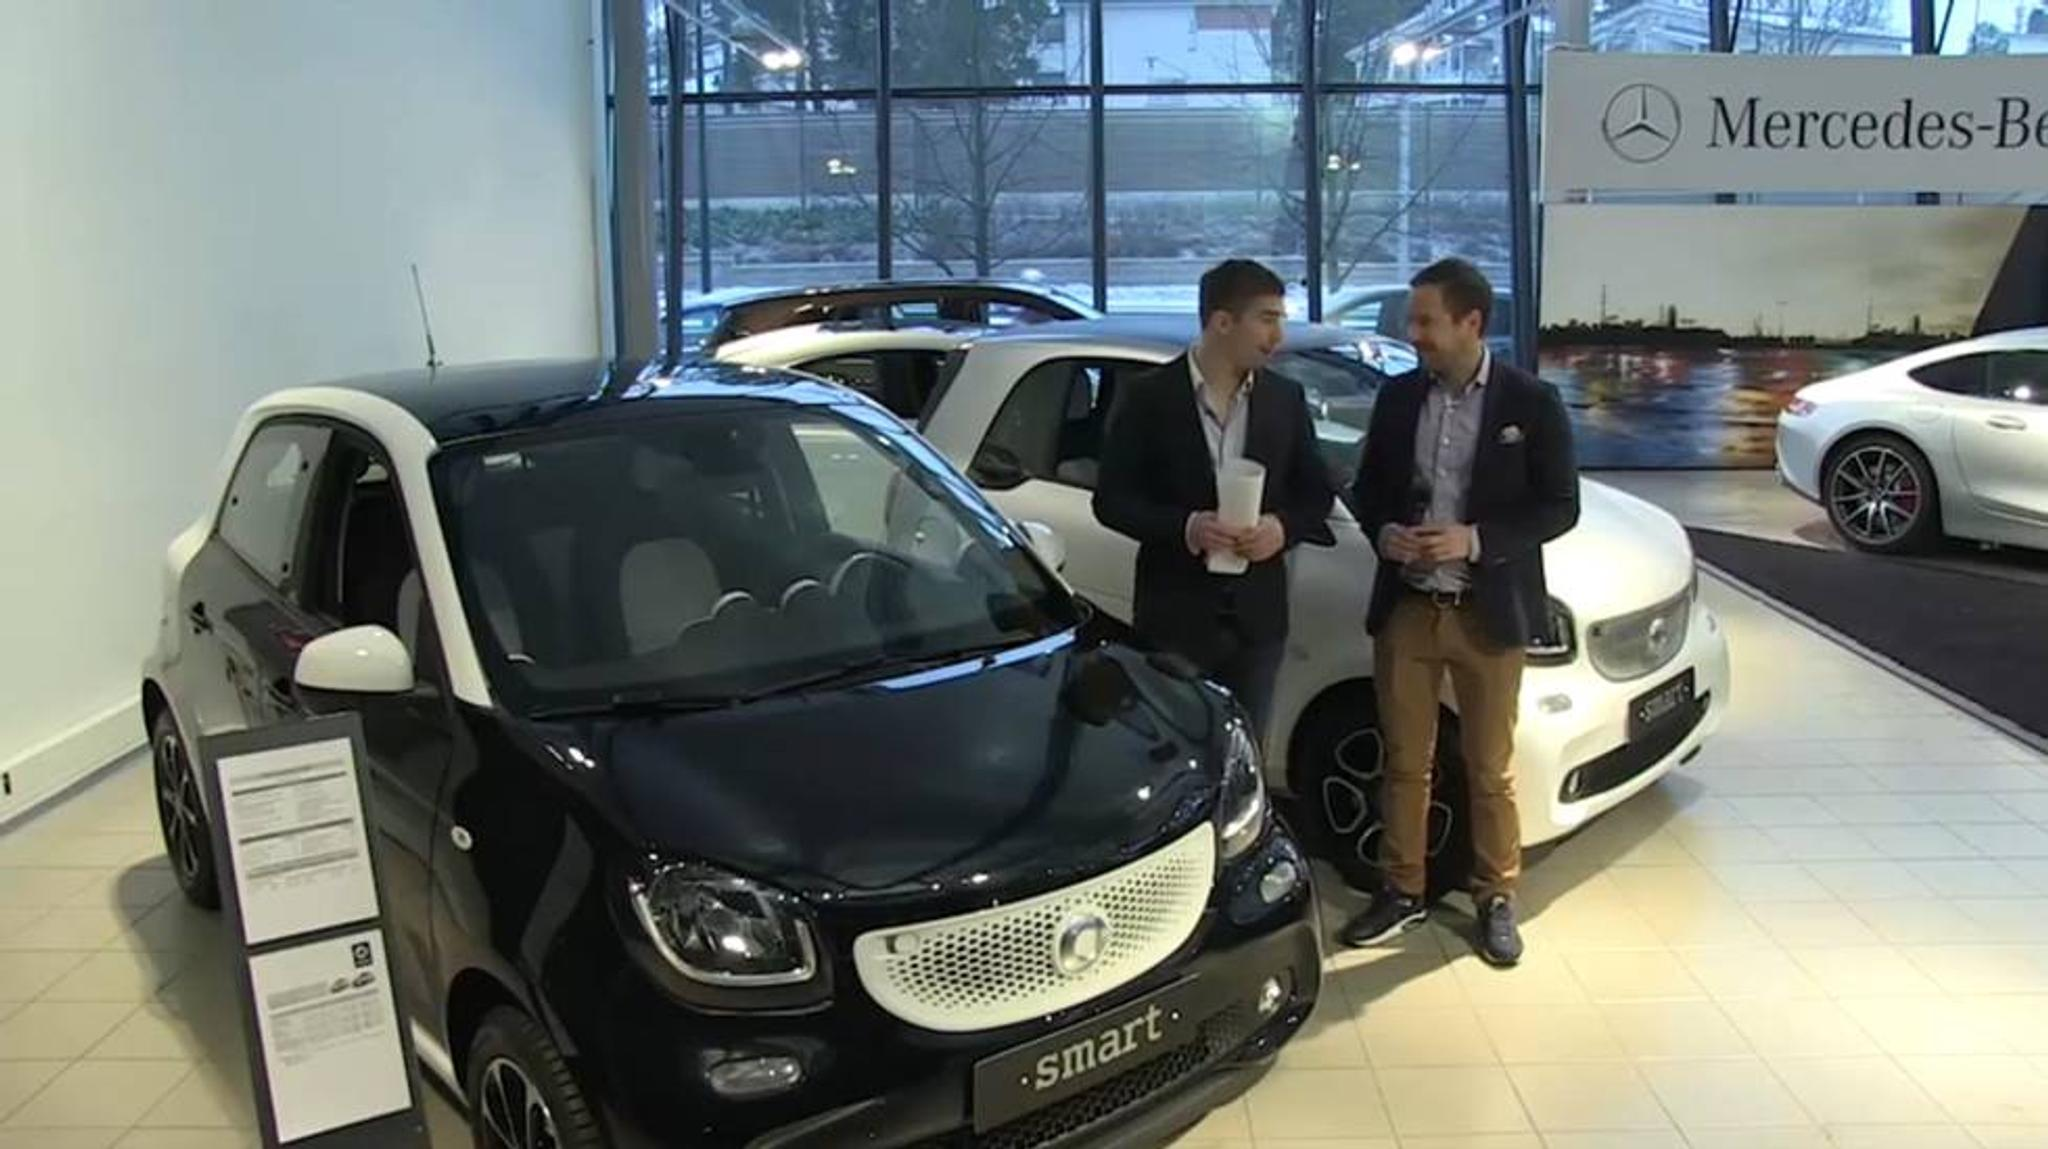 Mercedes Smart Car >> Historiallinen Autonayttely Esittelyssa Smart Fortwo Ja Forfour Tuulilasi